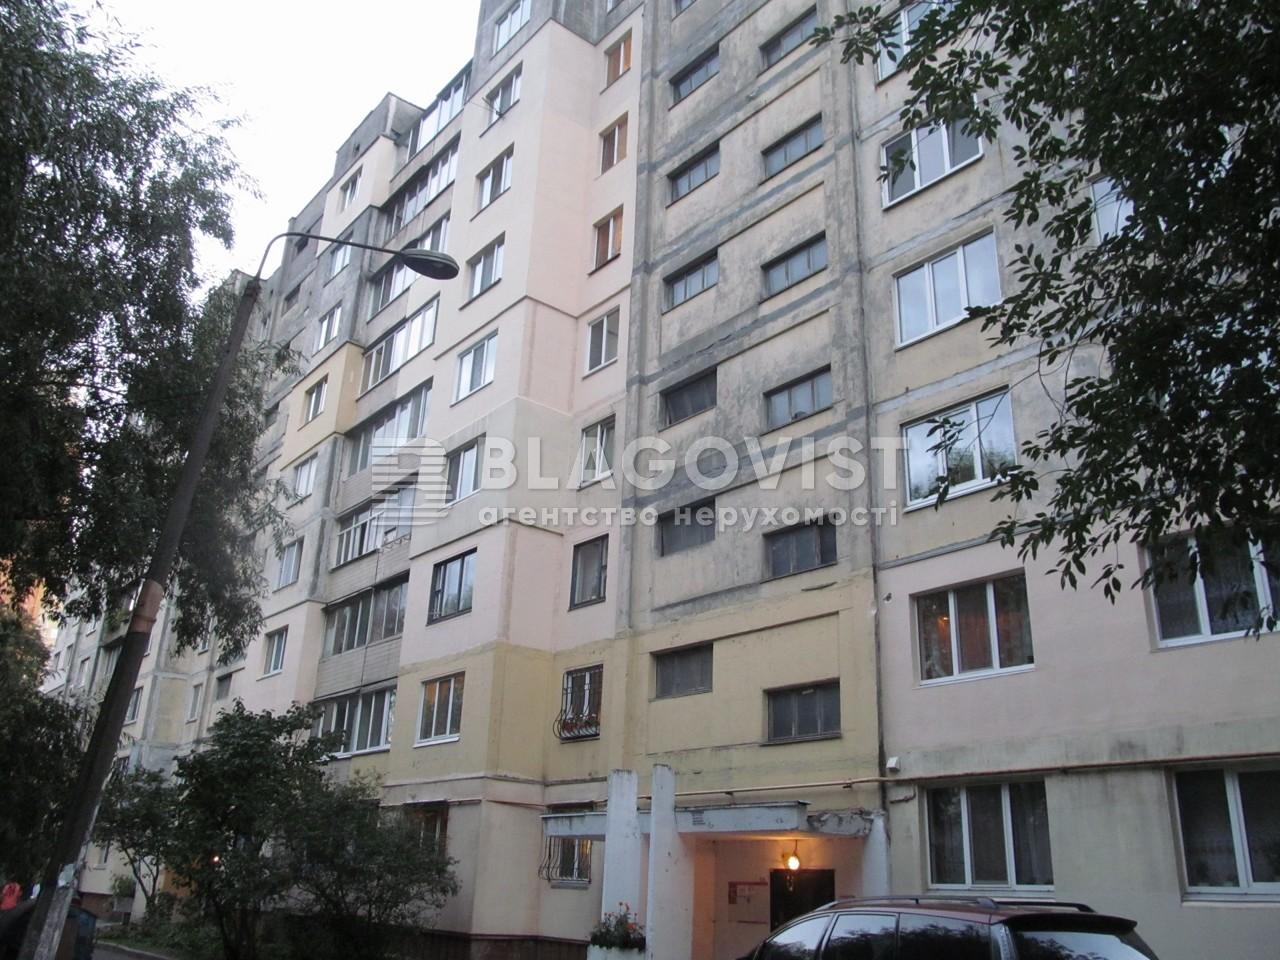 Квартира F-36984, Смилянская, 17, Киев - Фото 2